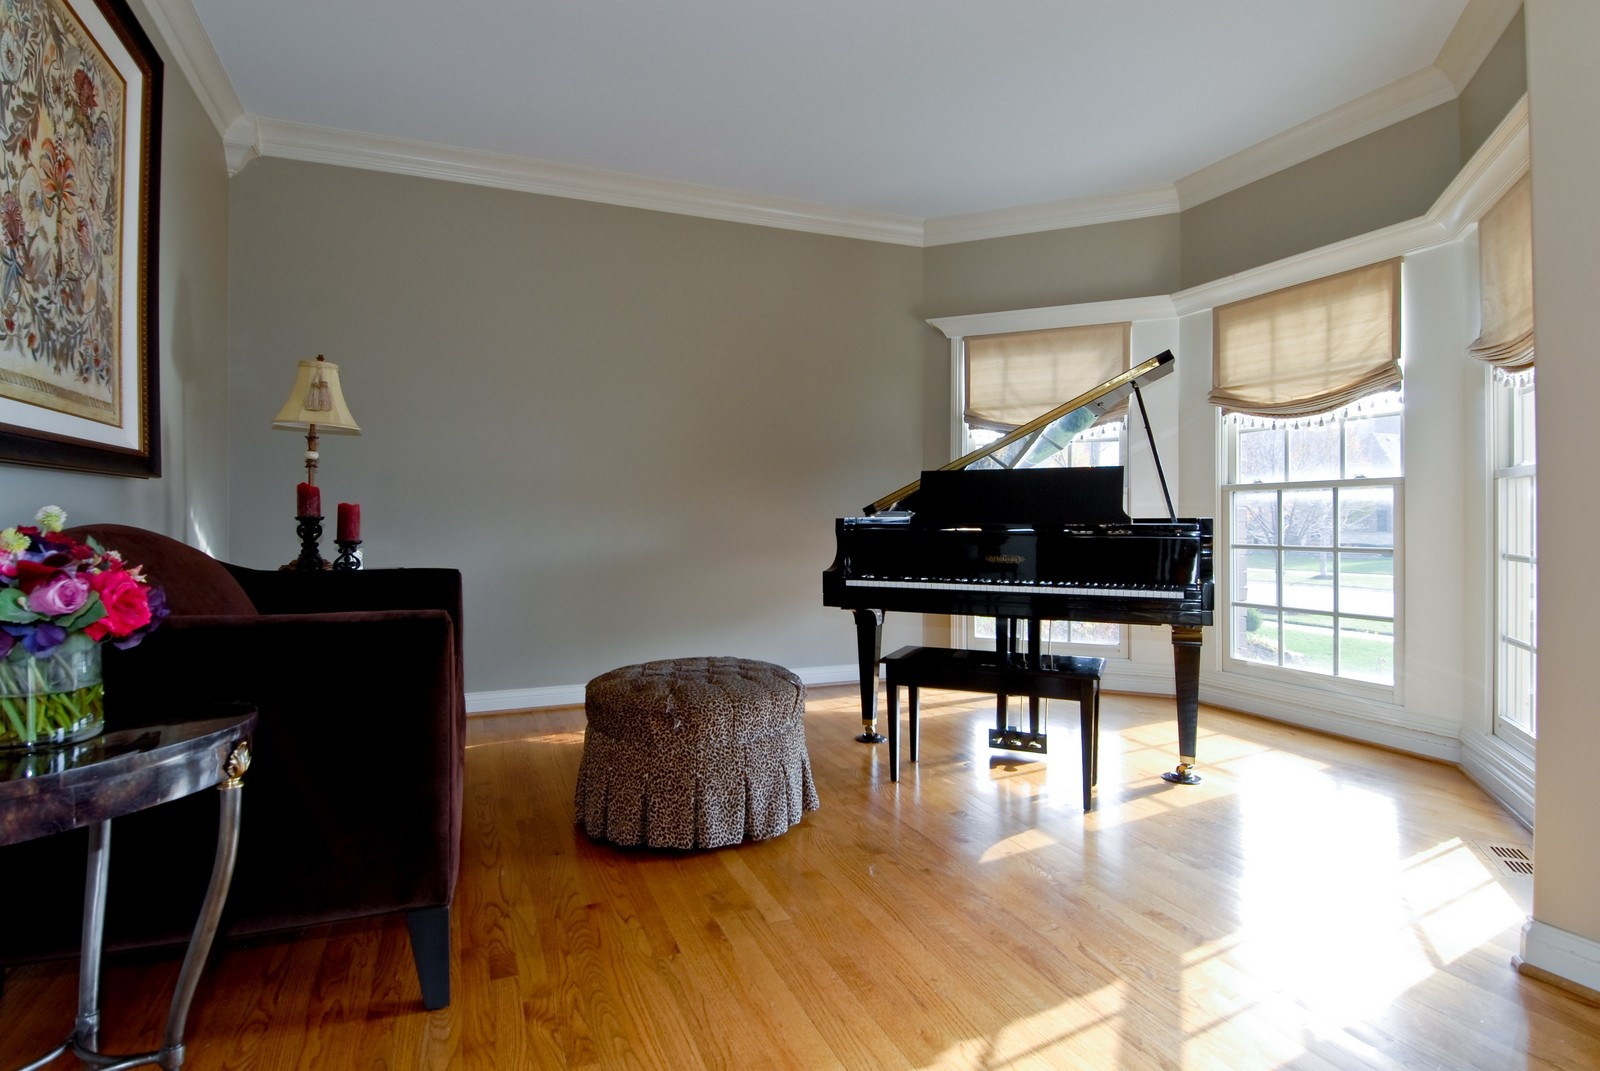 Real Estate Photography - 3839 Junebreeze Ln, Naperville, IL, 60564 - Living Room